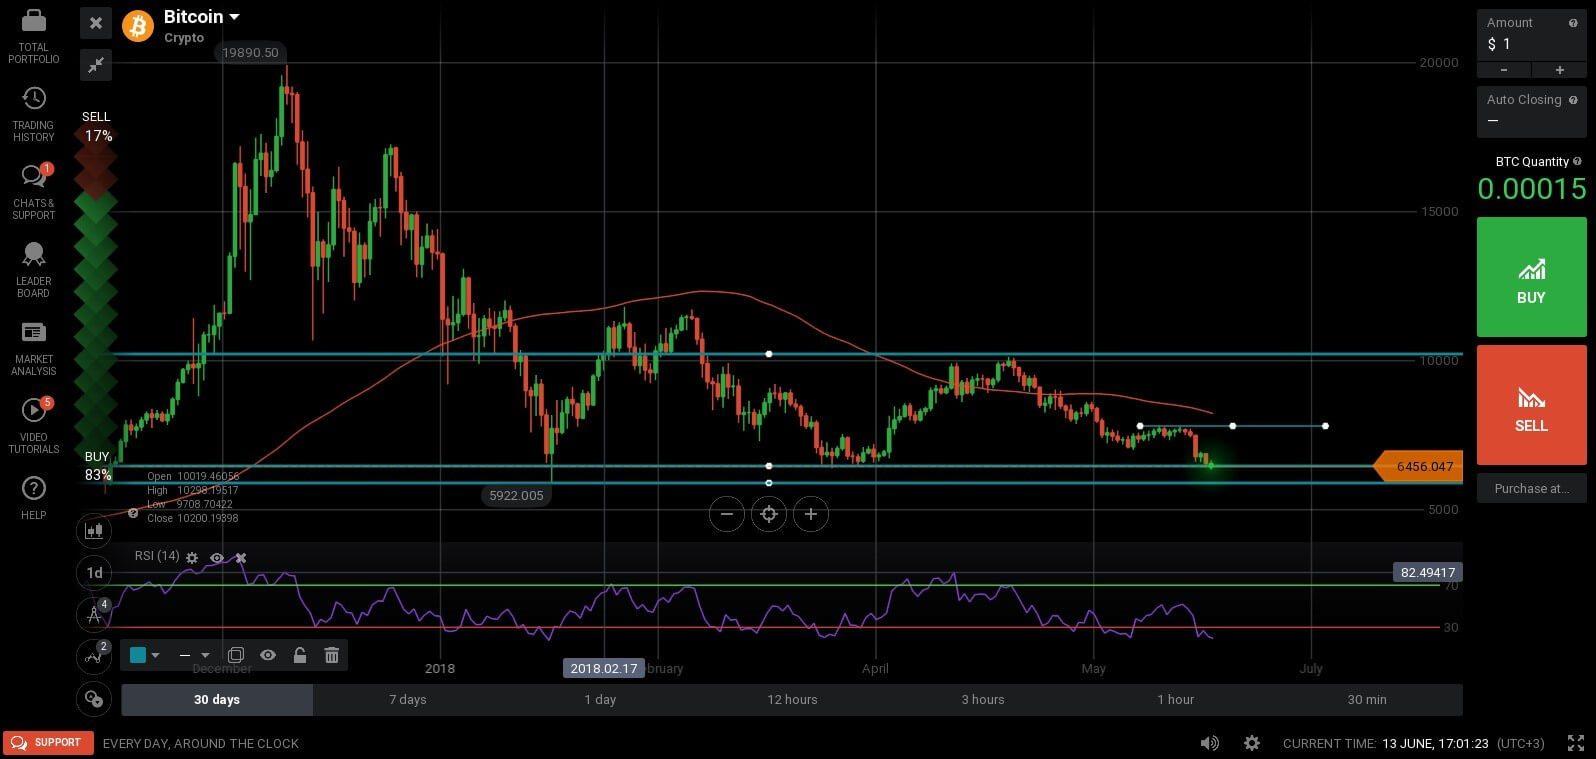 0.0015 BTC Bitcoin to HUF Hungarian Forint